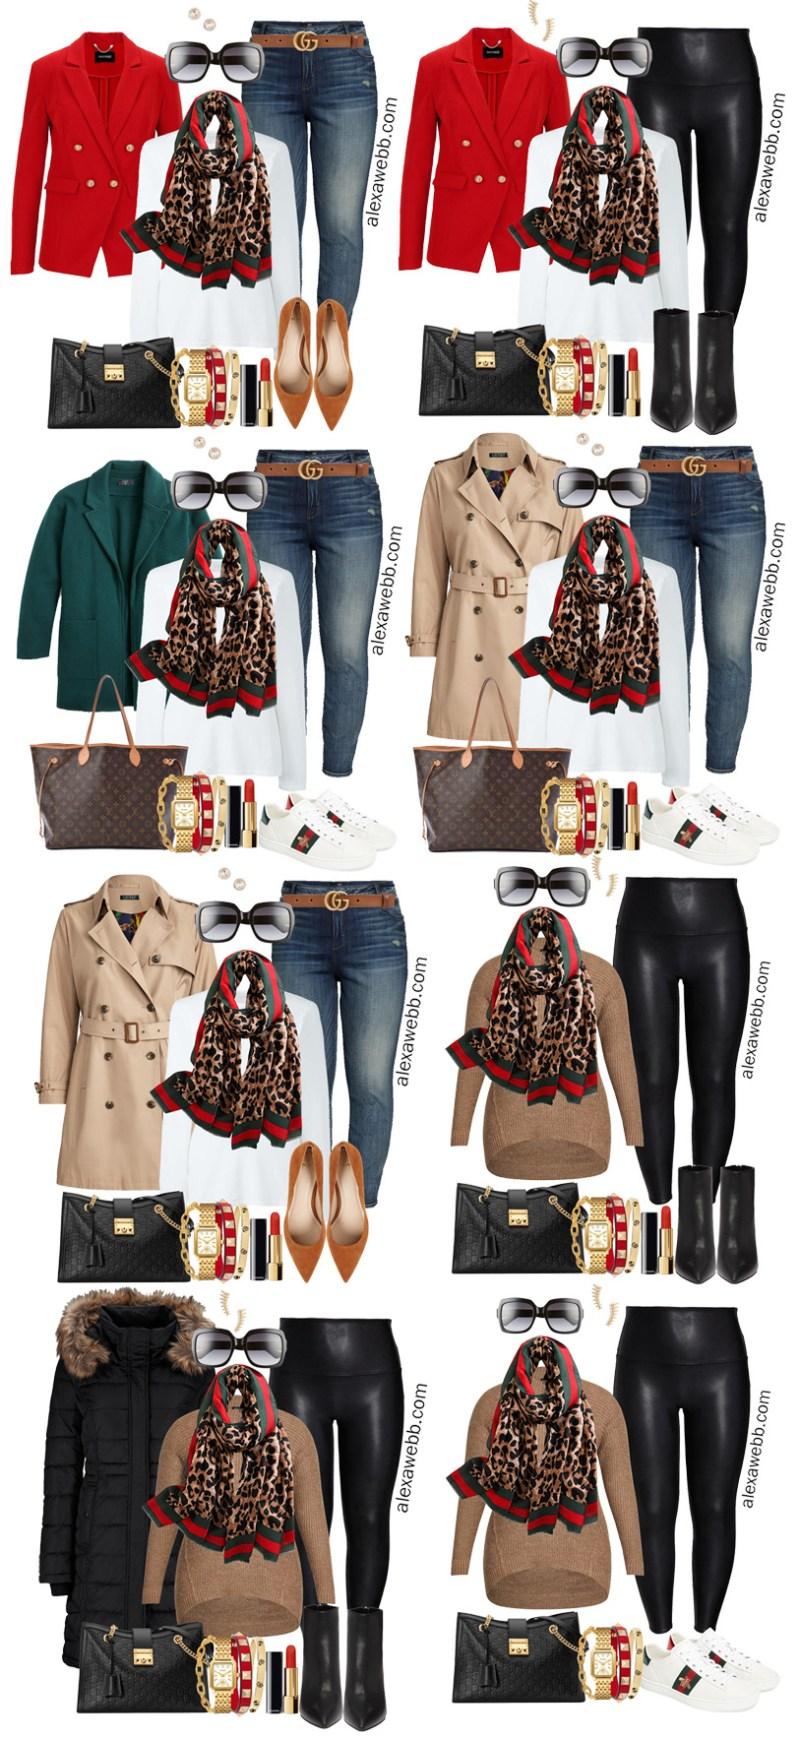 Plus Size Gucci Scarf Outfit Ideas - Jeans, Gucci Belt, Red Blazer, White T-Shirt - Alexa Webb - Plus Size Fashion for Women - #alexawebb #plussize